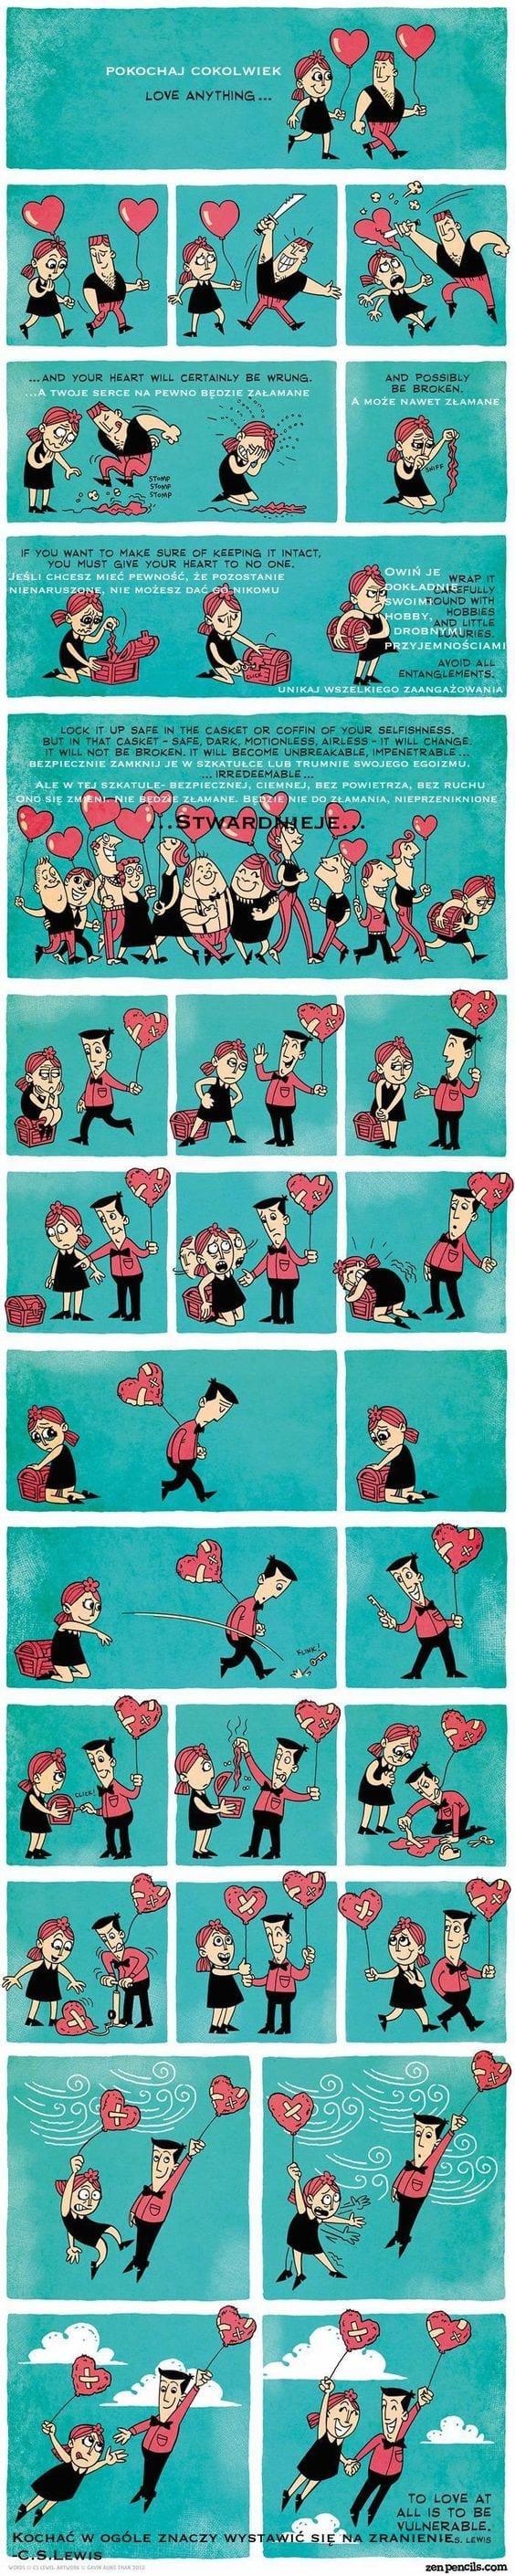 pokochaj-cokolwiek  Złamane serce- jak przetrwać pokochaj cokolwiek